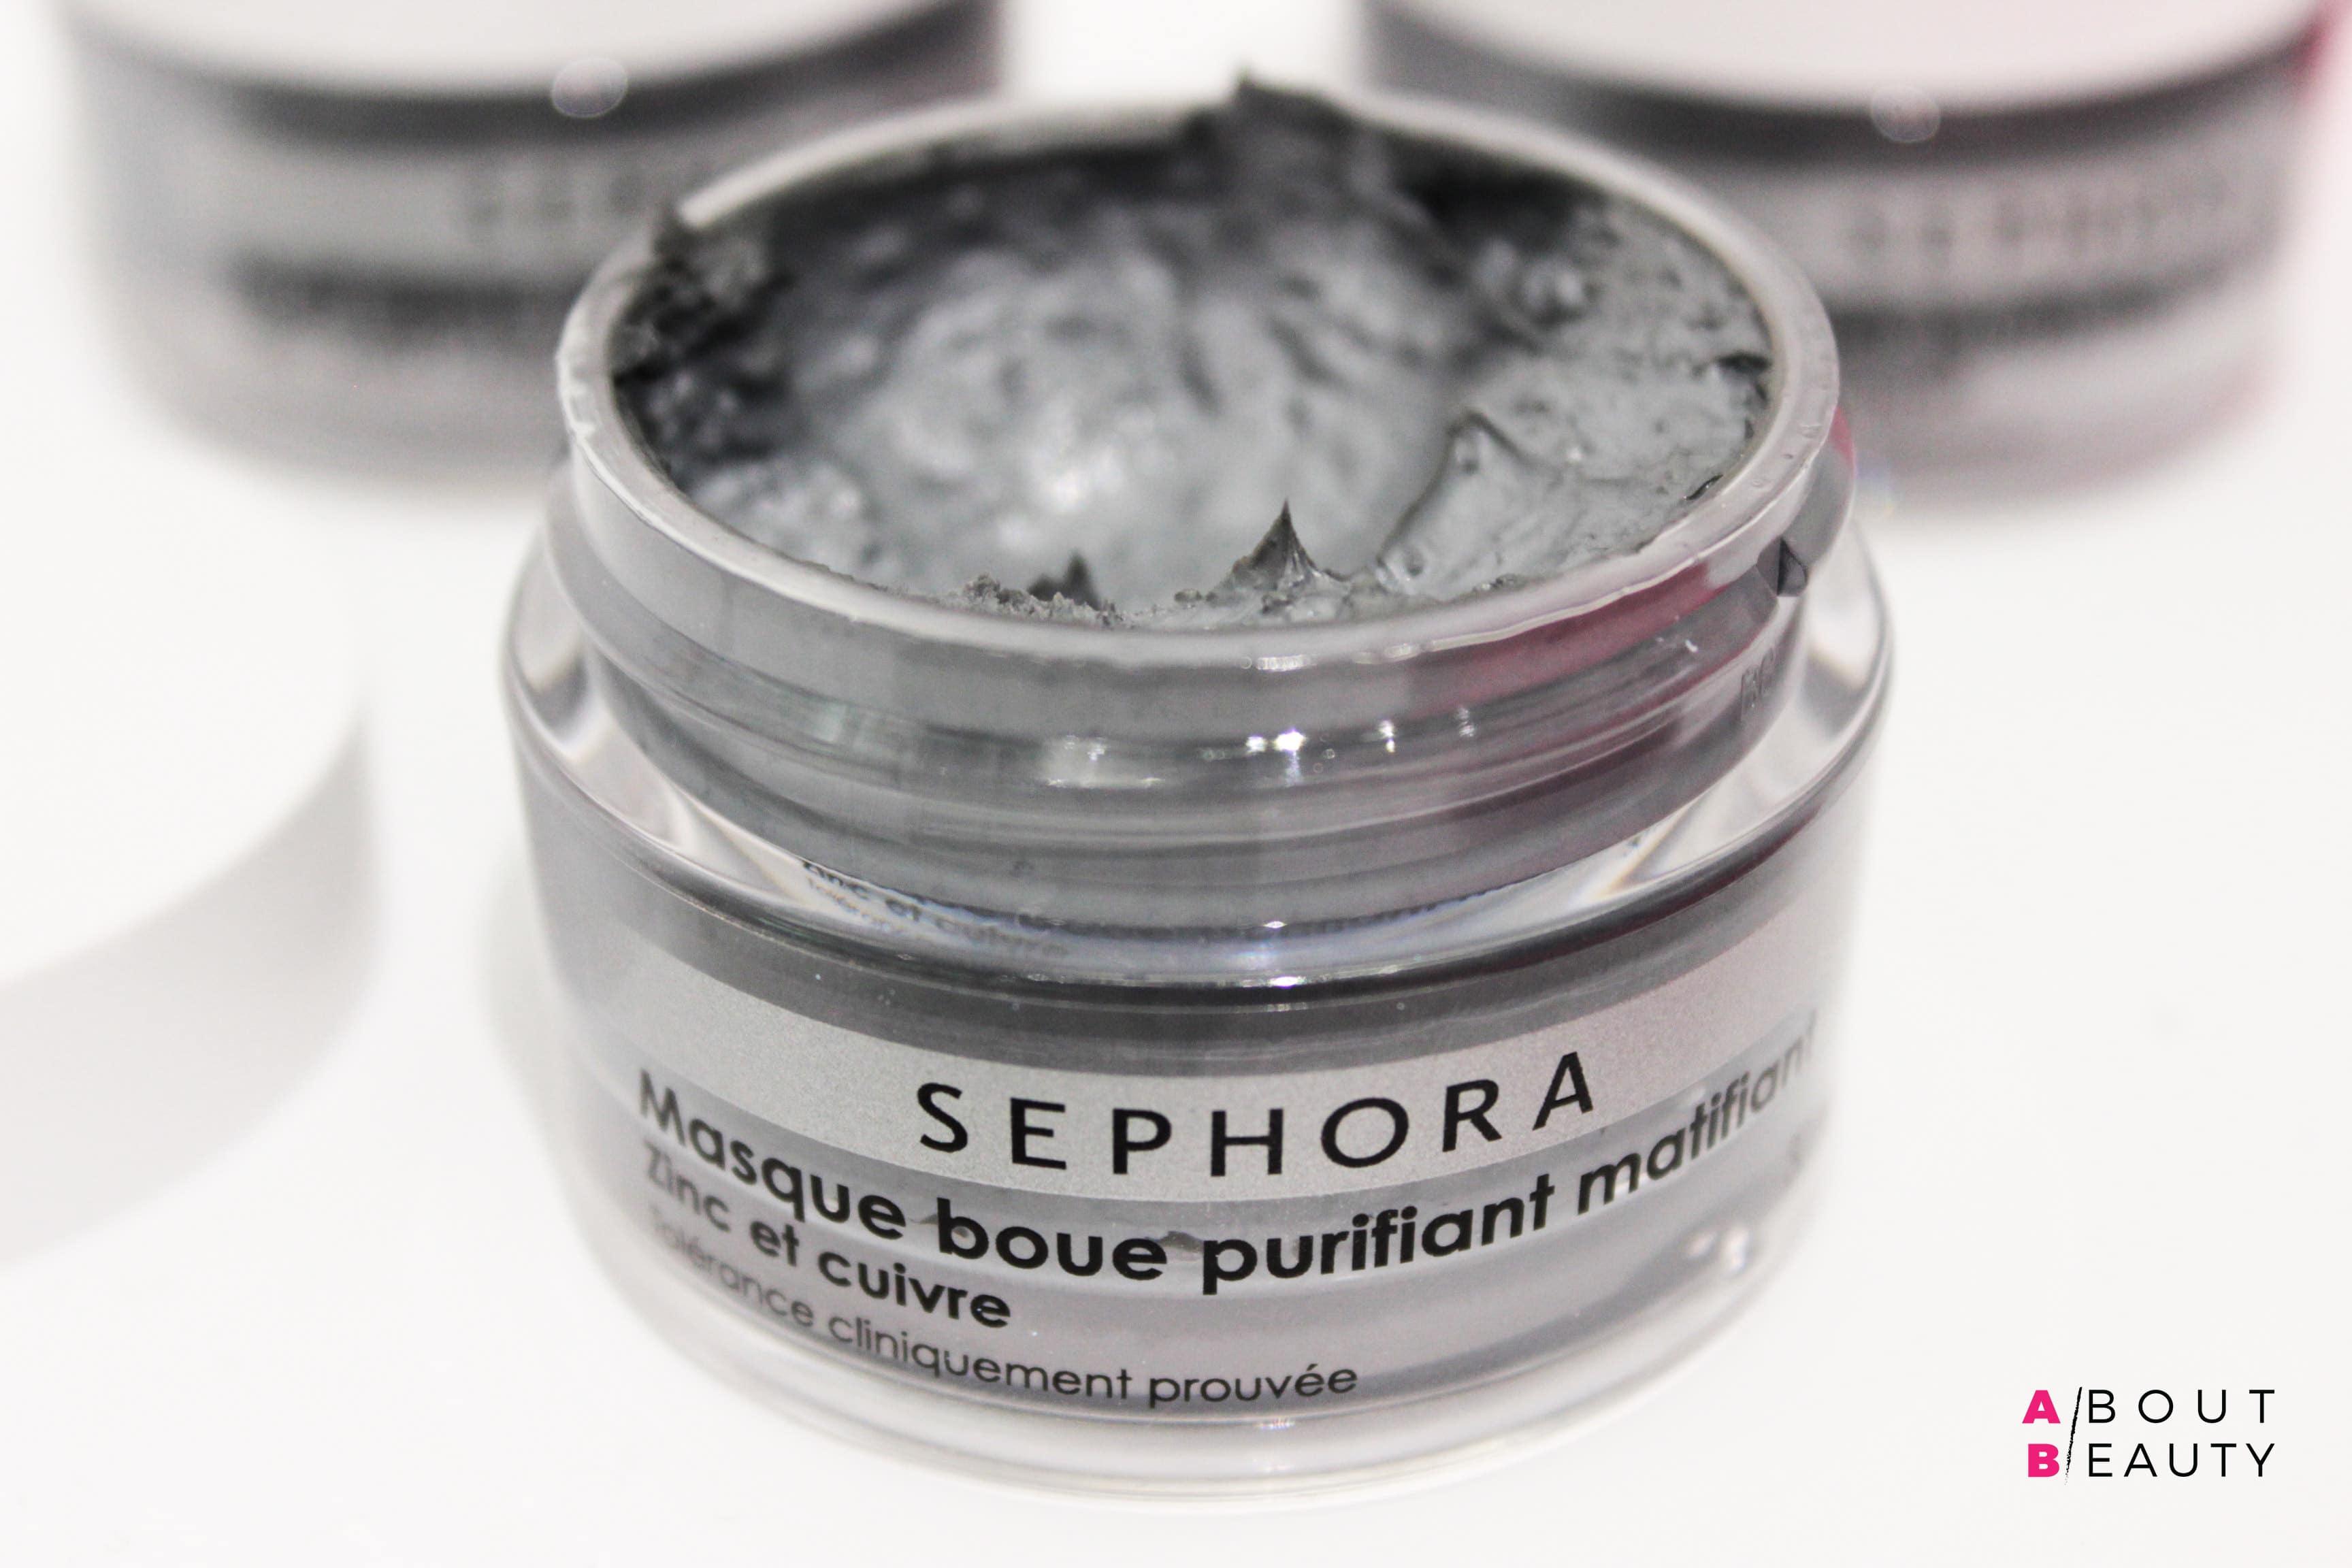 Skin Care Sephora: Mud Mask, maschera purificante